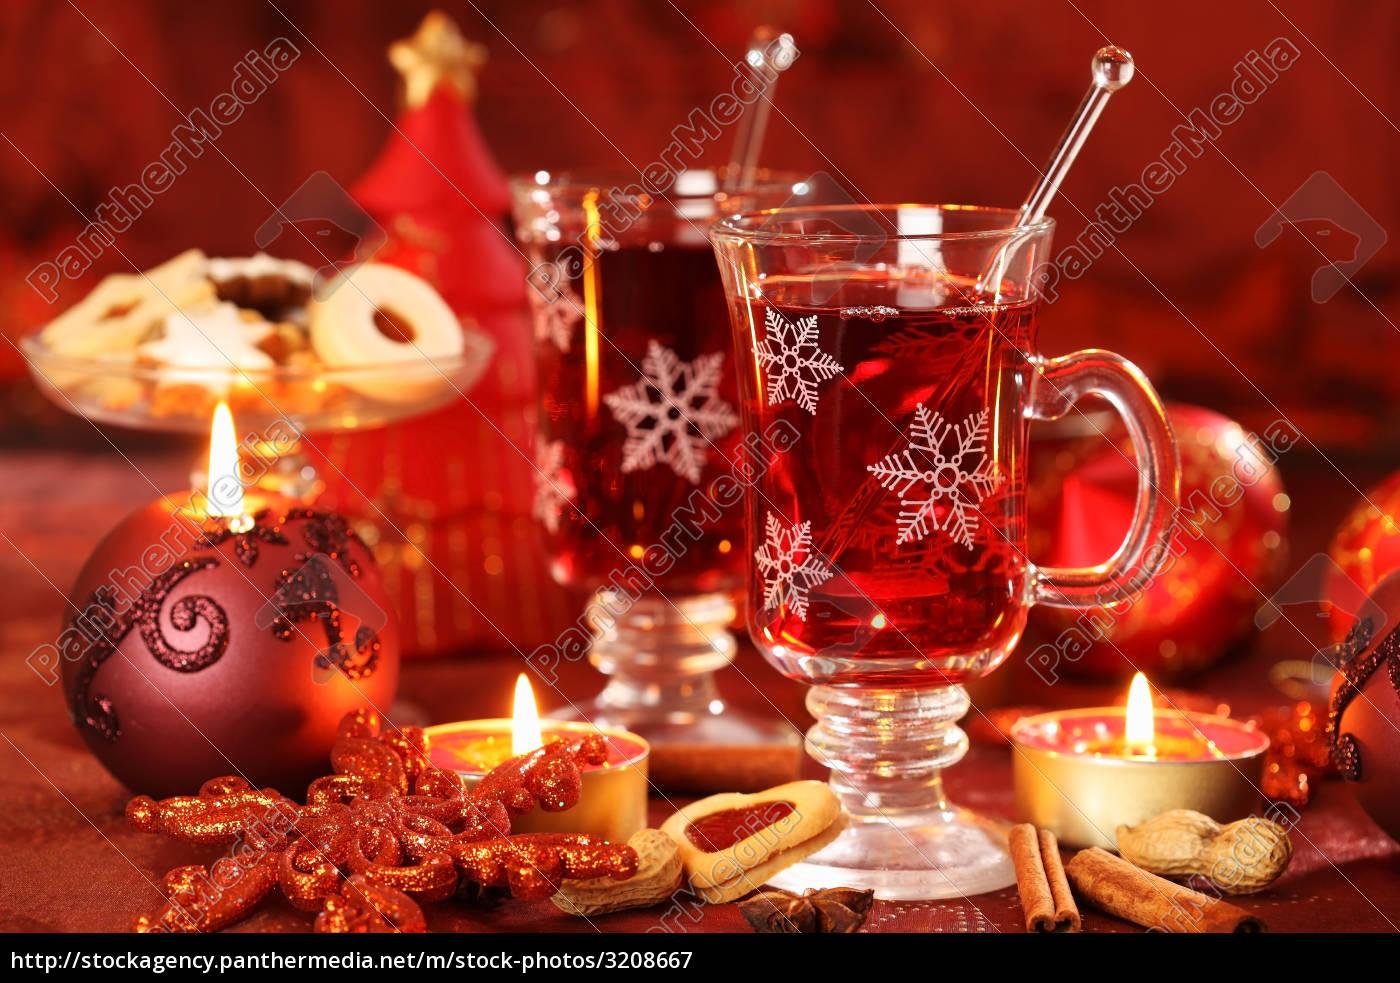 tea, life, exist, existence, living, lives - 3208667